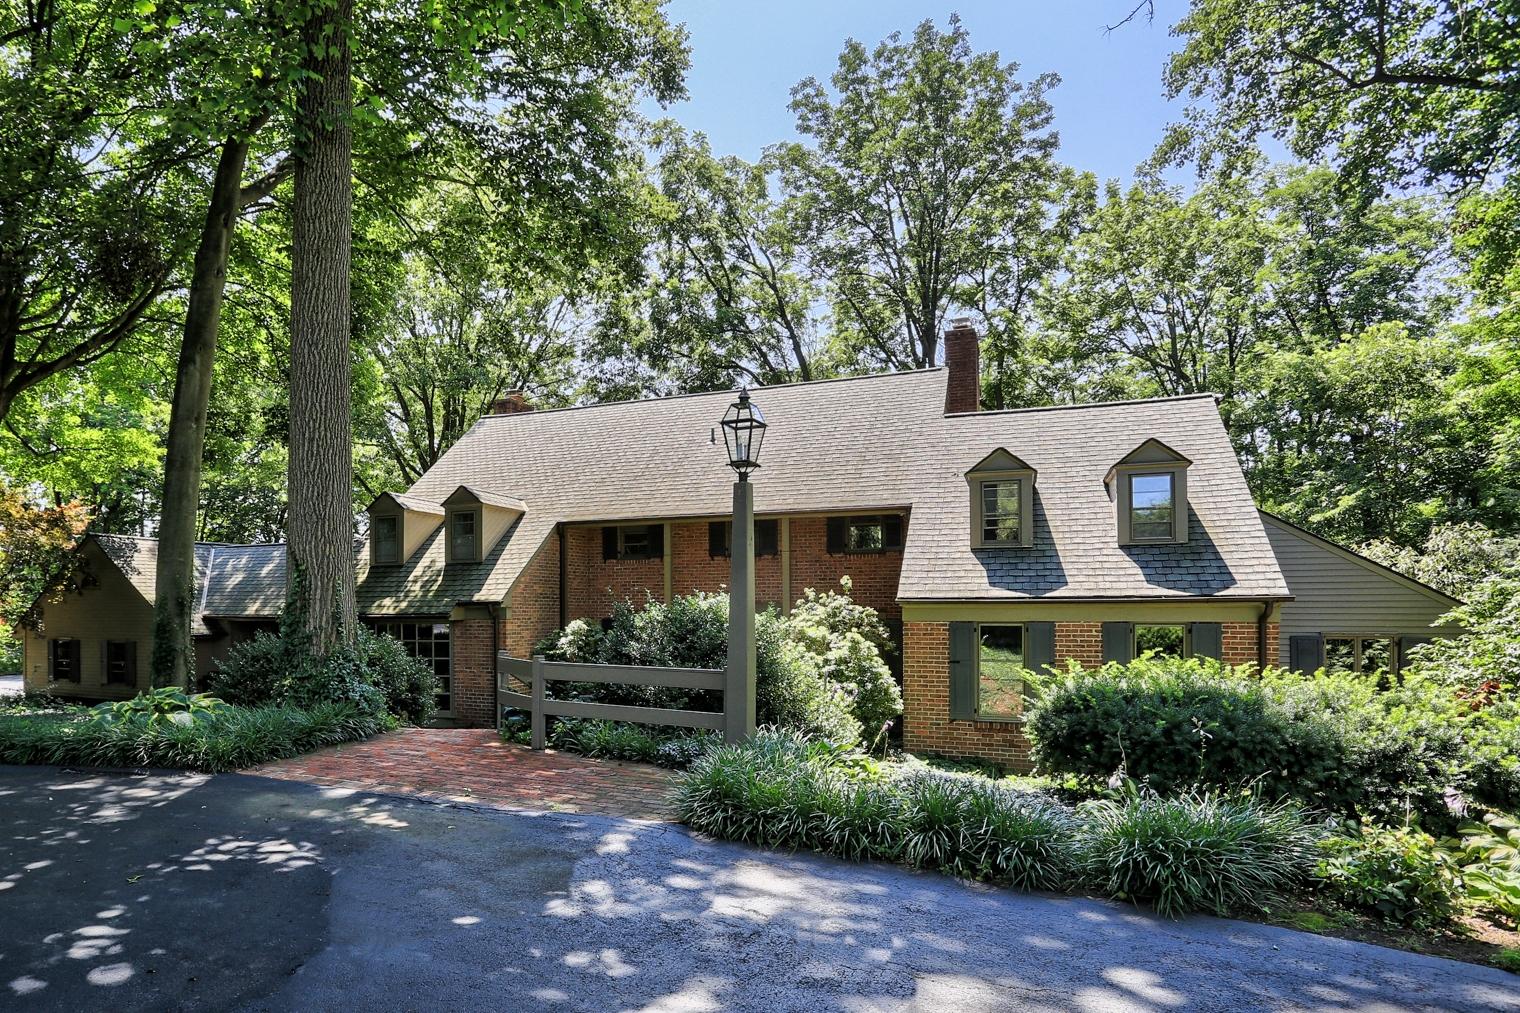 Single Family Home for Sale at 195 Eshelman road Lancaster, Pennsylvania 17601 United States